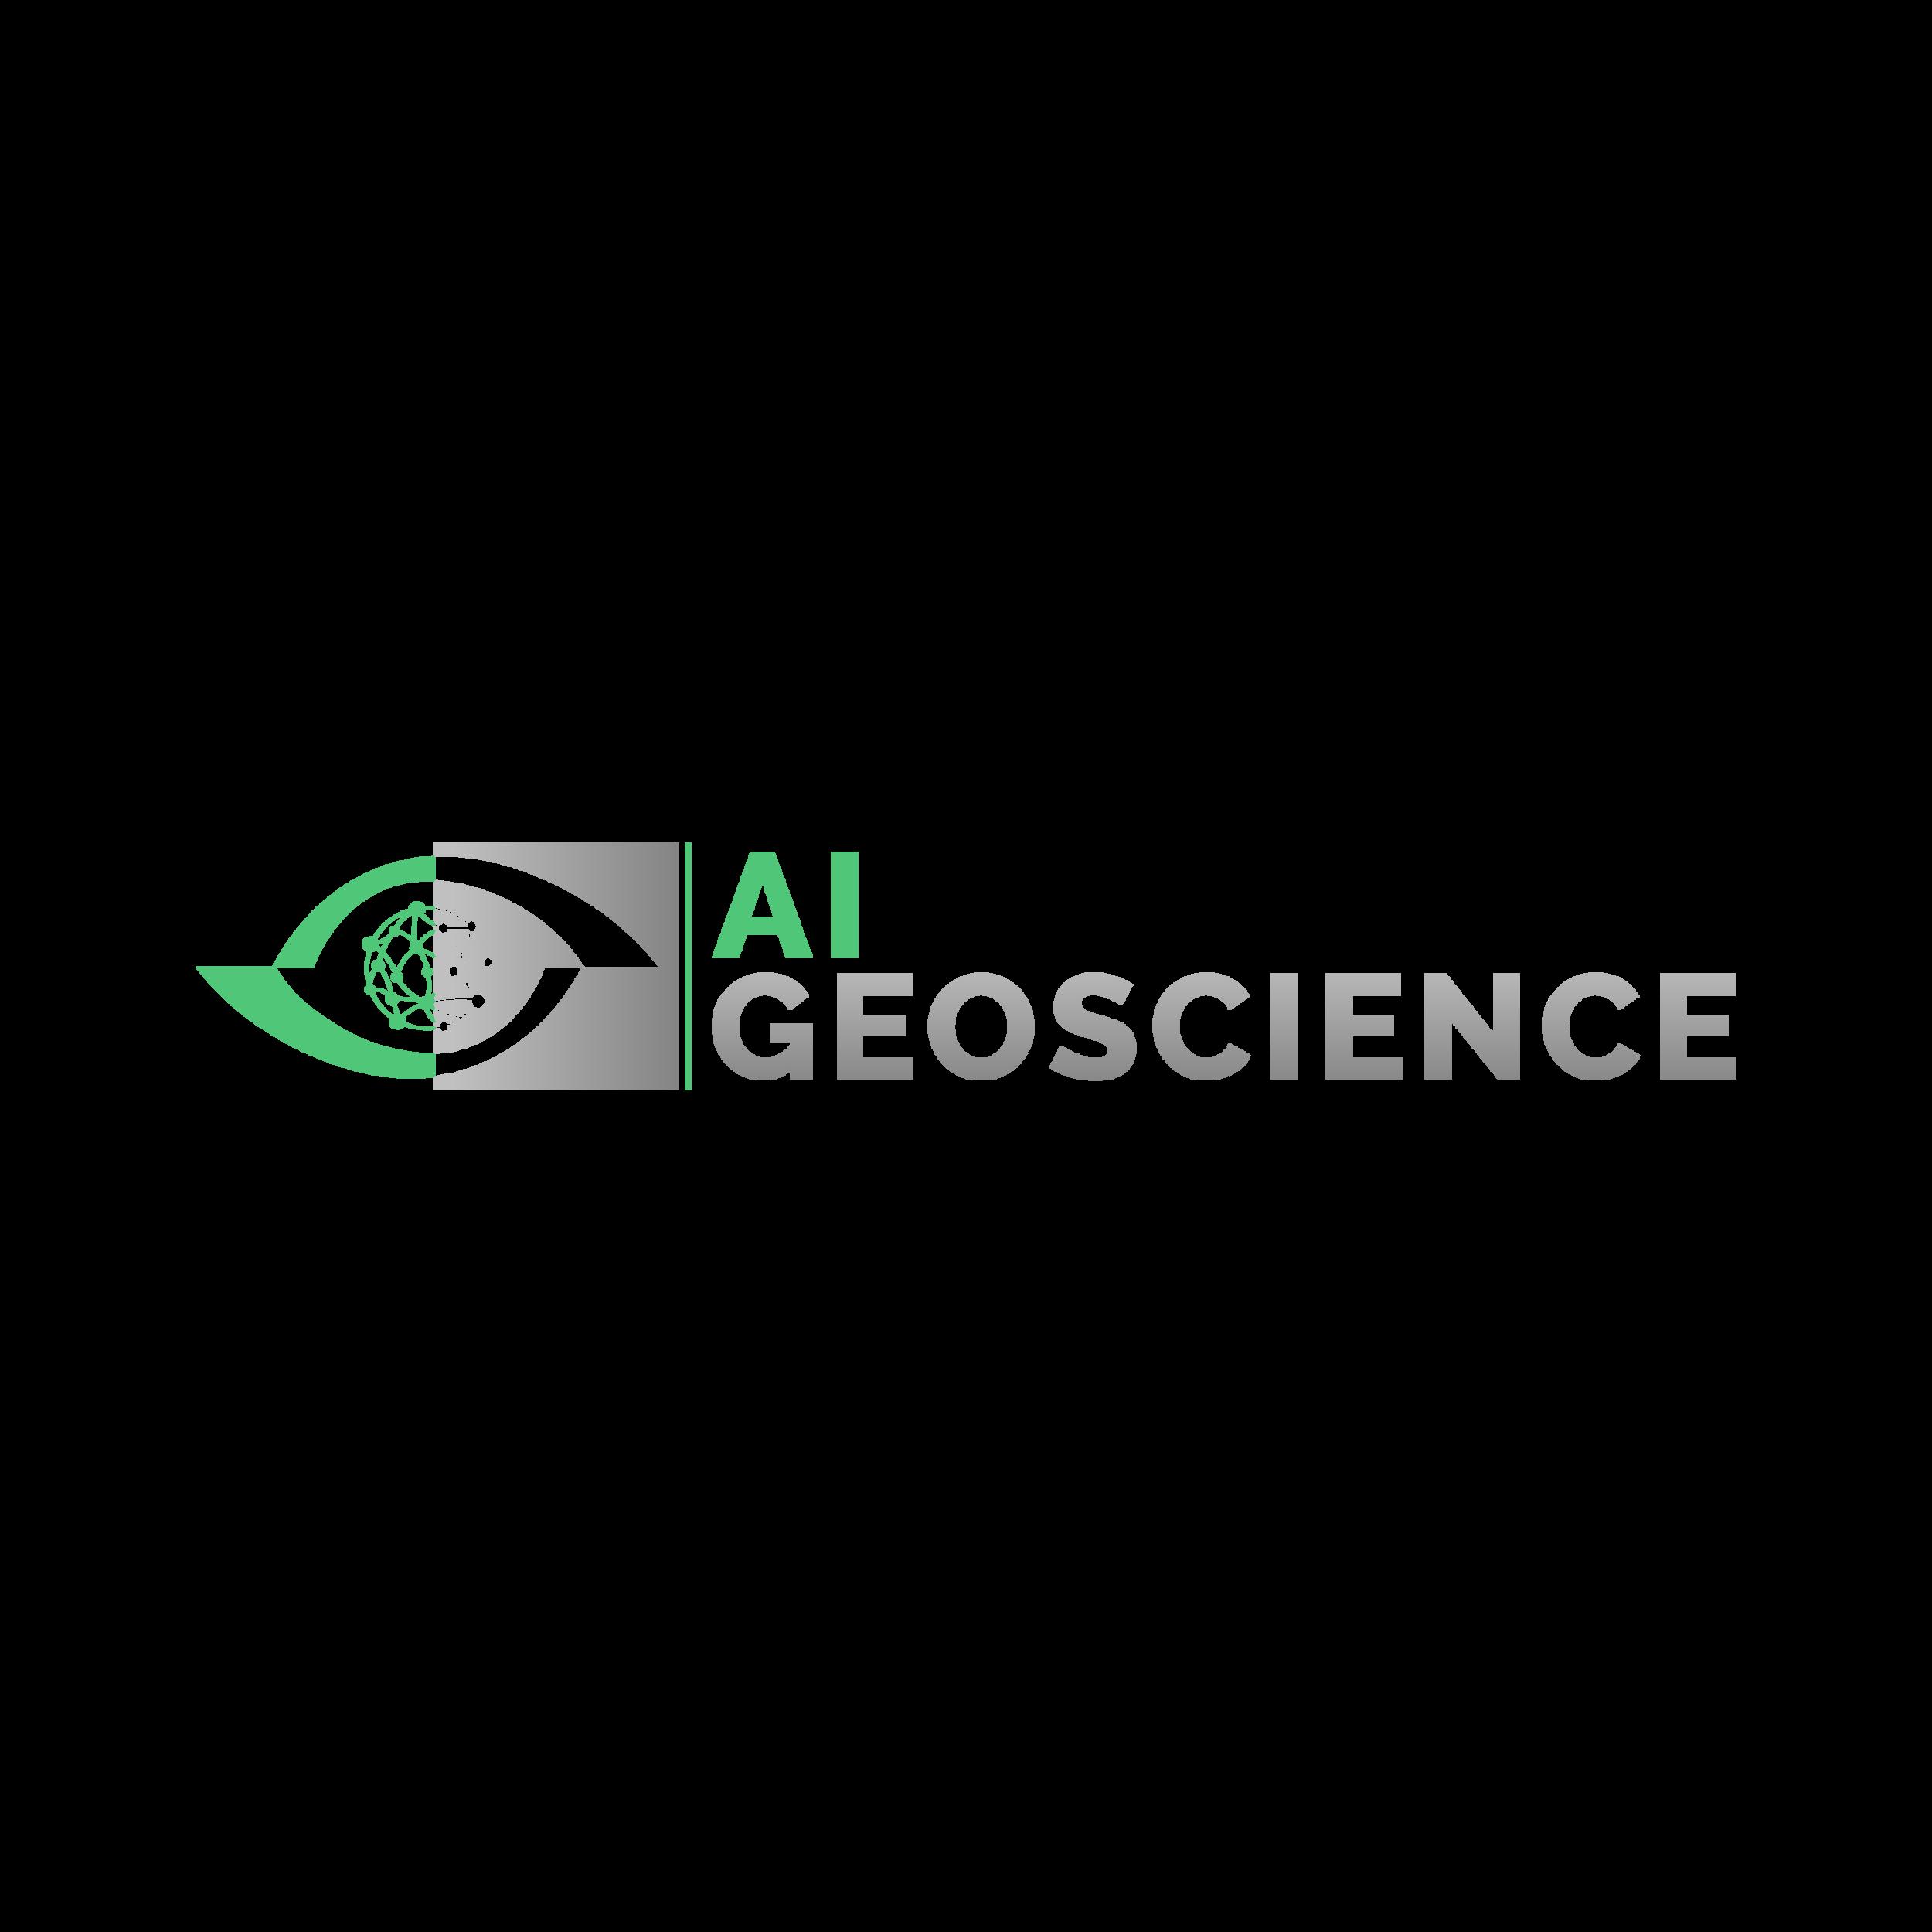 AI Geoscience logo).png